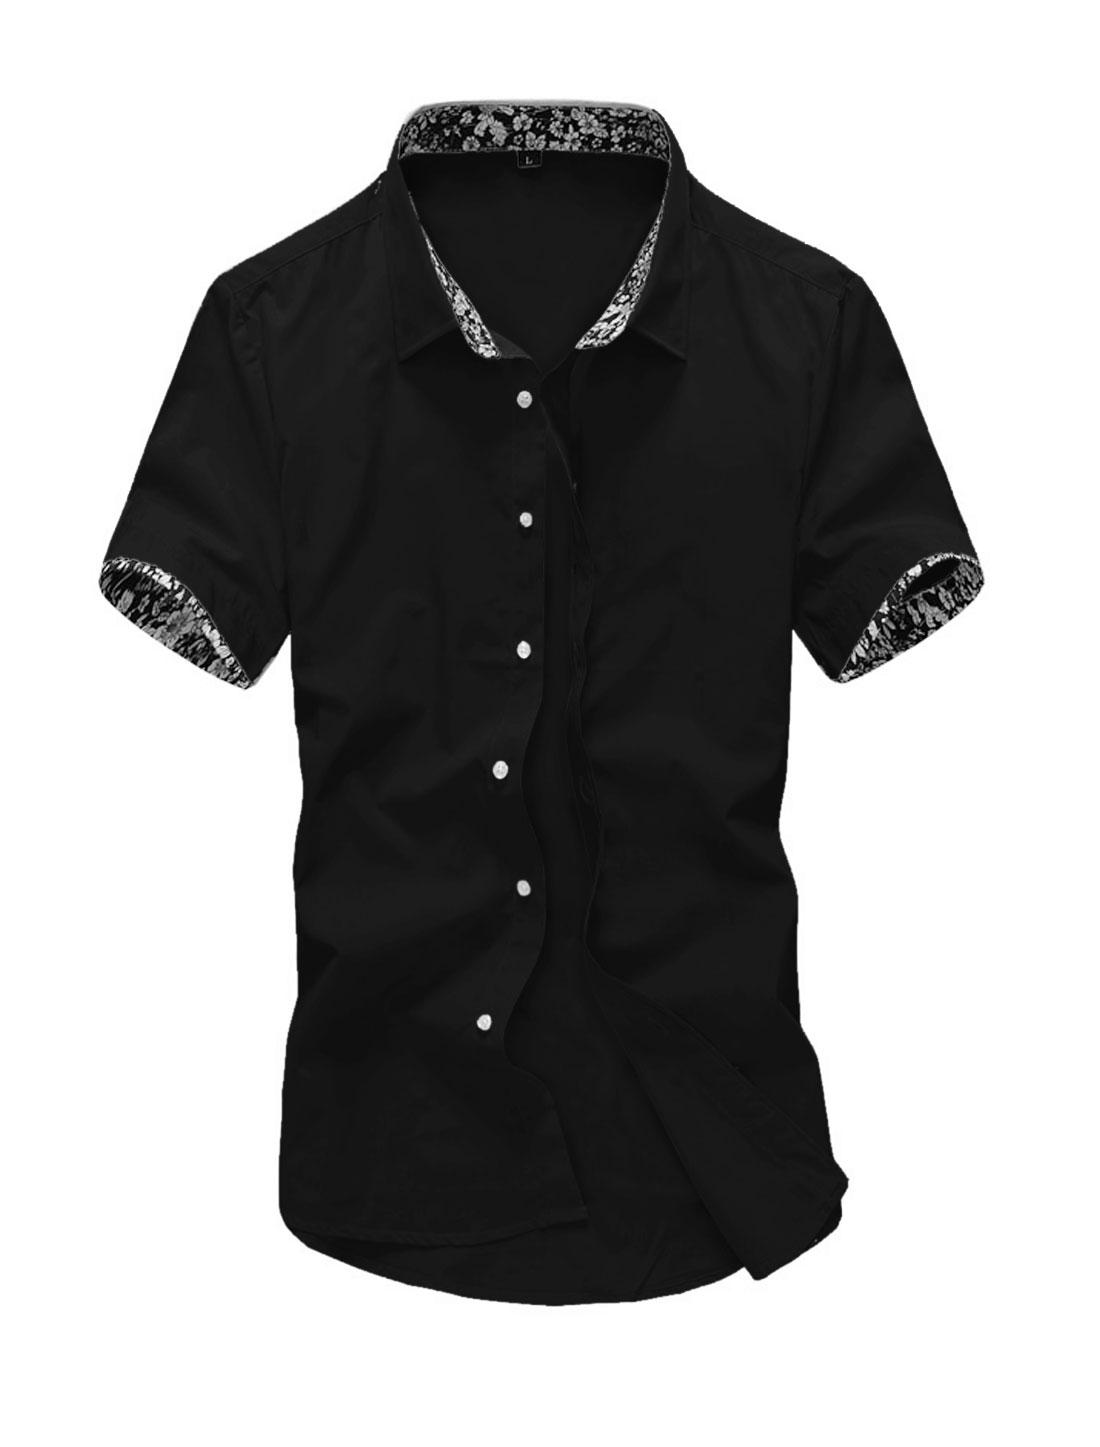 Men Short Sleeve Point Collar Button Down Slim Fit Shirts Black M